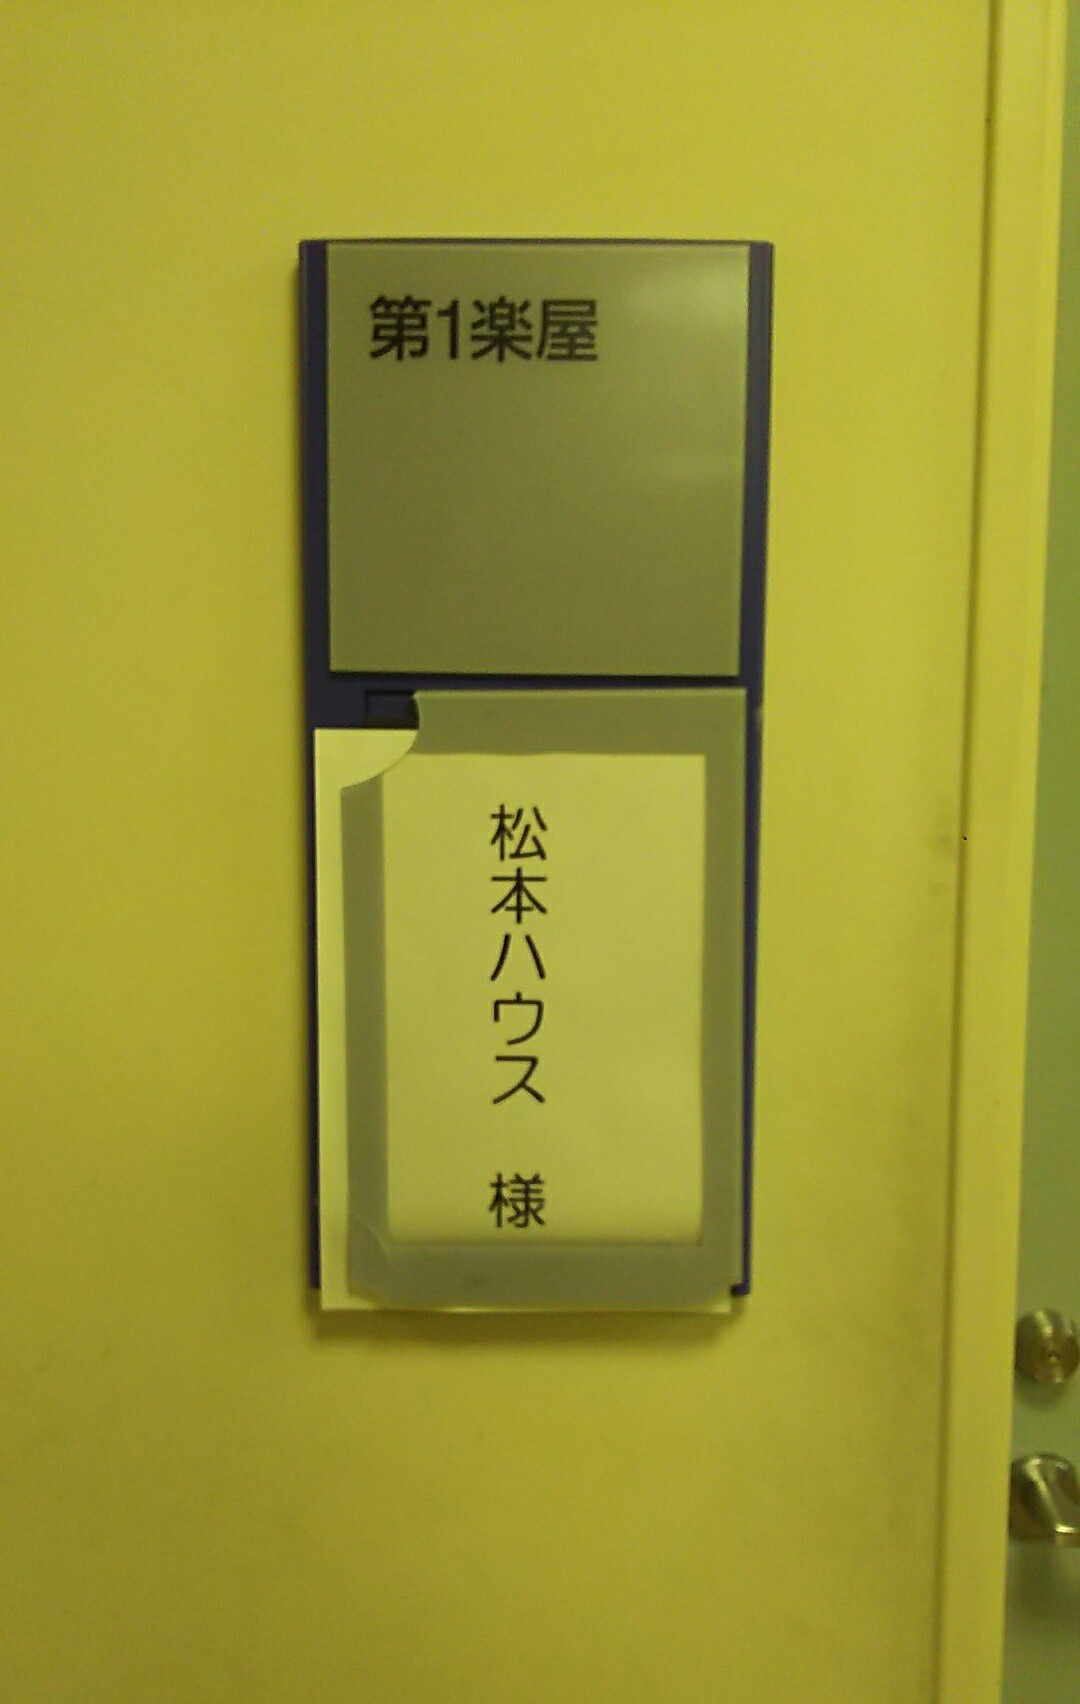 IMG_20161129_170234.jpg